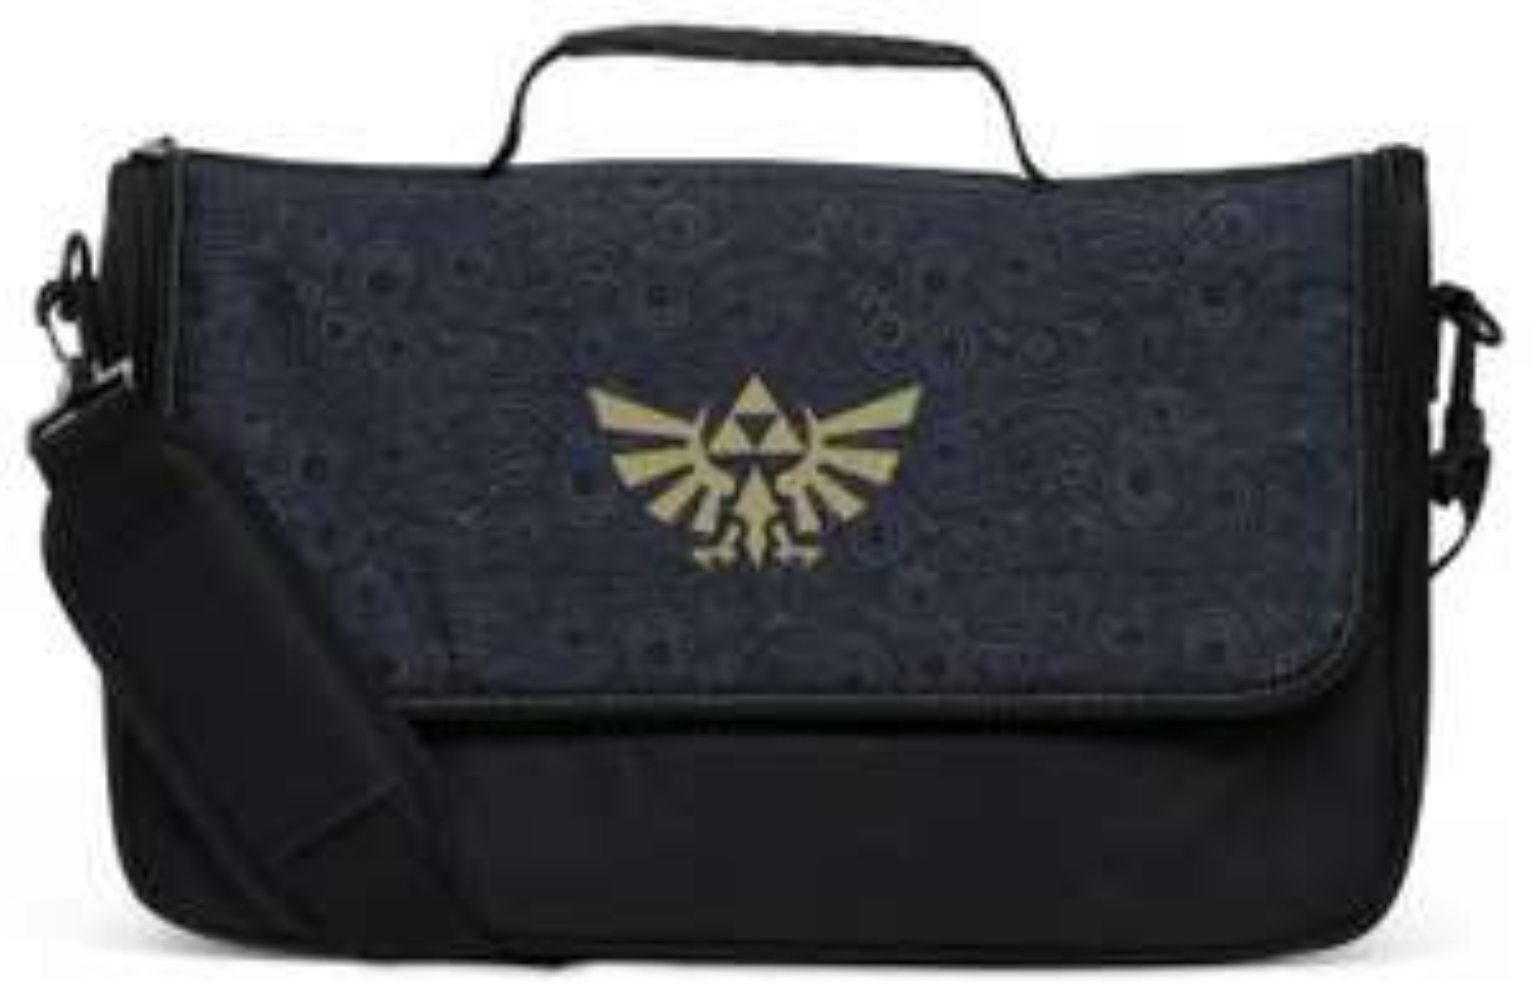 Everywhere Messenger Bag - Nintendo Switch: Legend of Zelda, £9.99 (UK Mainland) at Argos on eBay